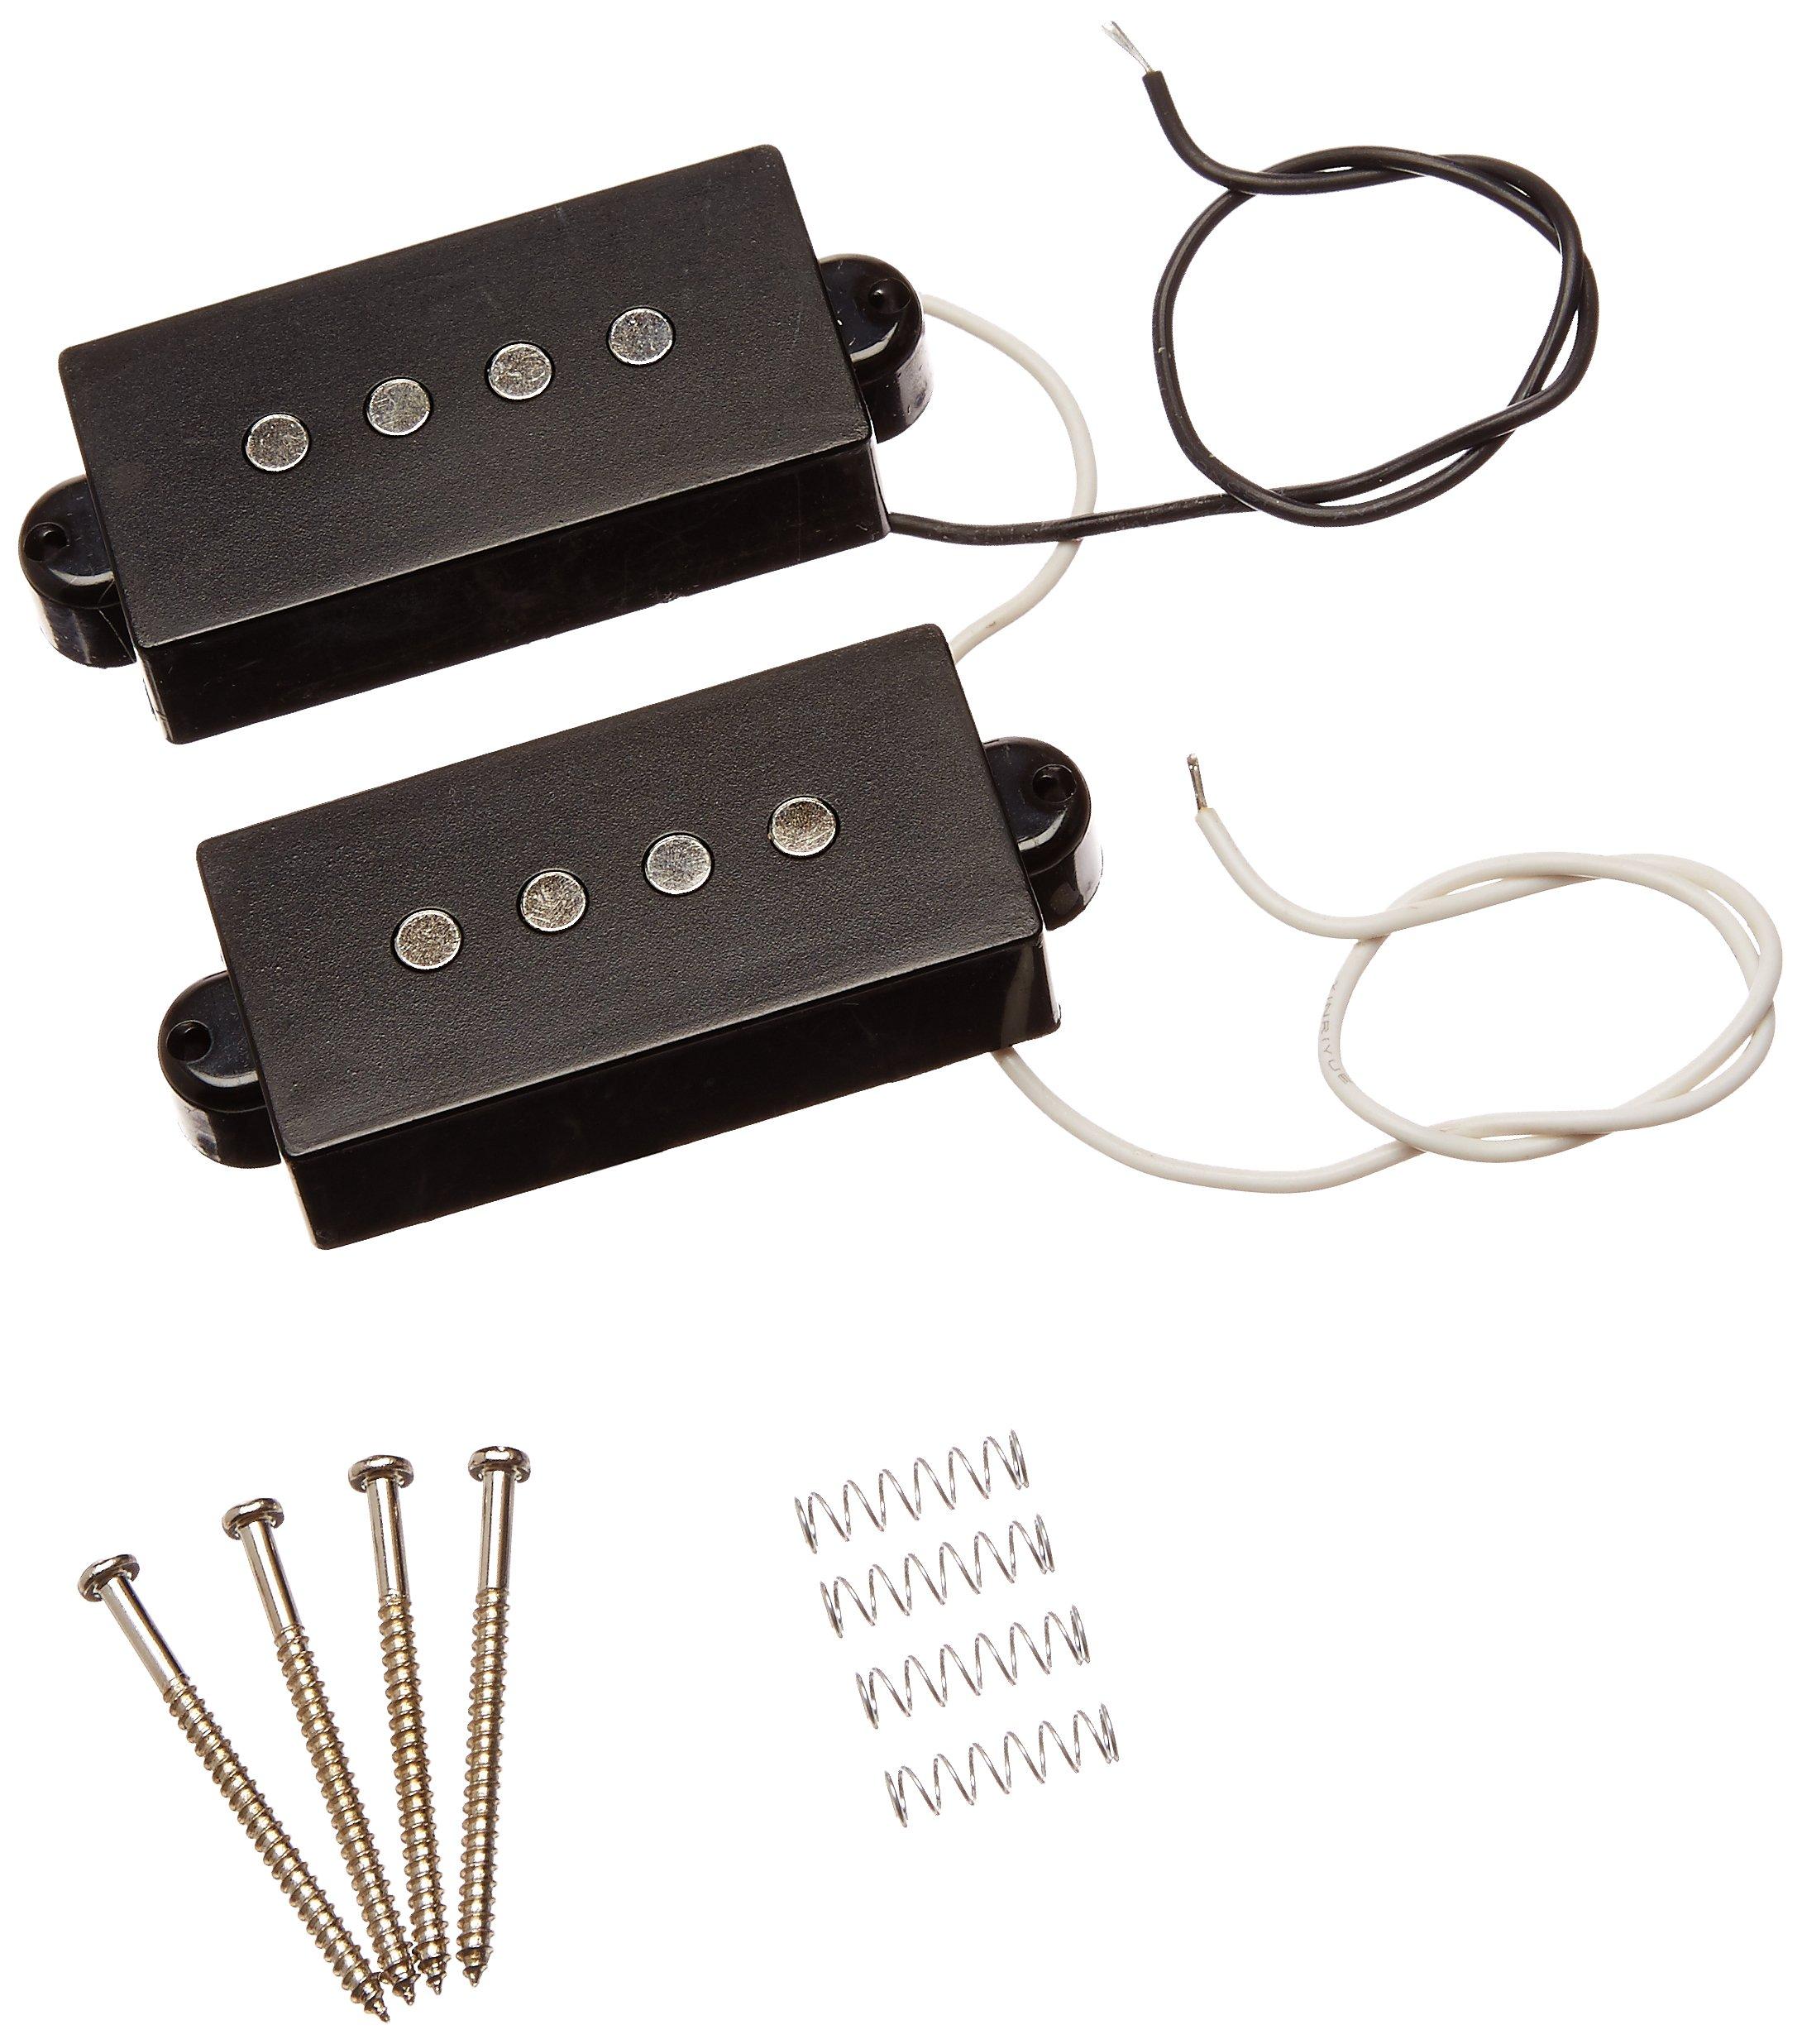 Noiseless Bass Pickups : 4 string noiseless humbucker pickup set f precision p bass replacement 1 set ebay ~ Russianpoet.info Haus und Dekorationen